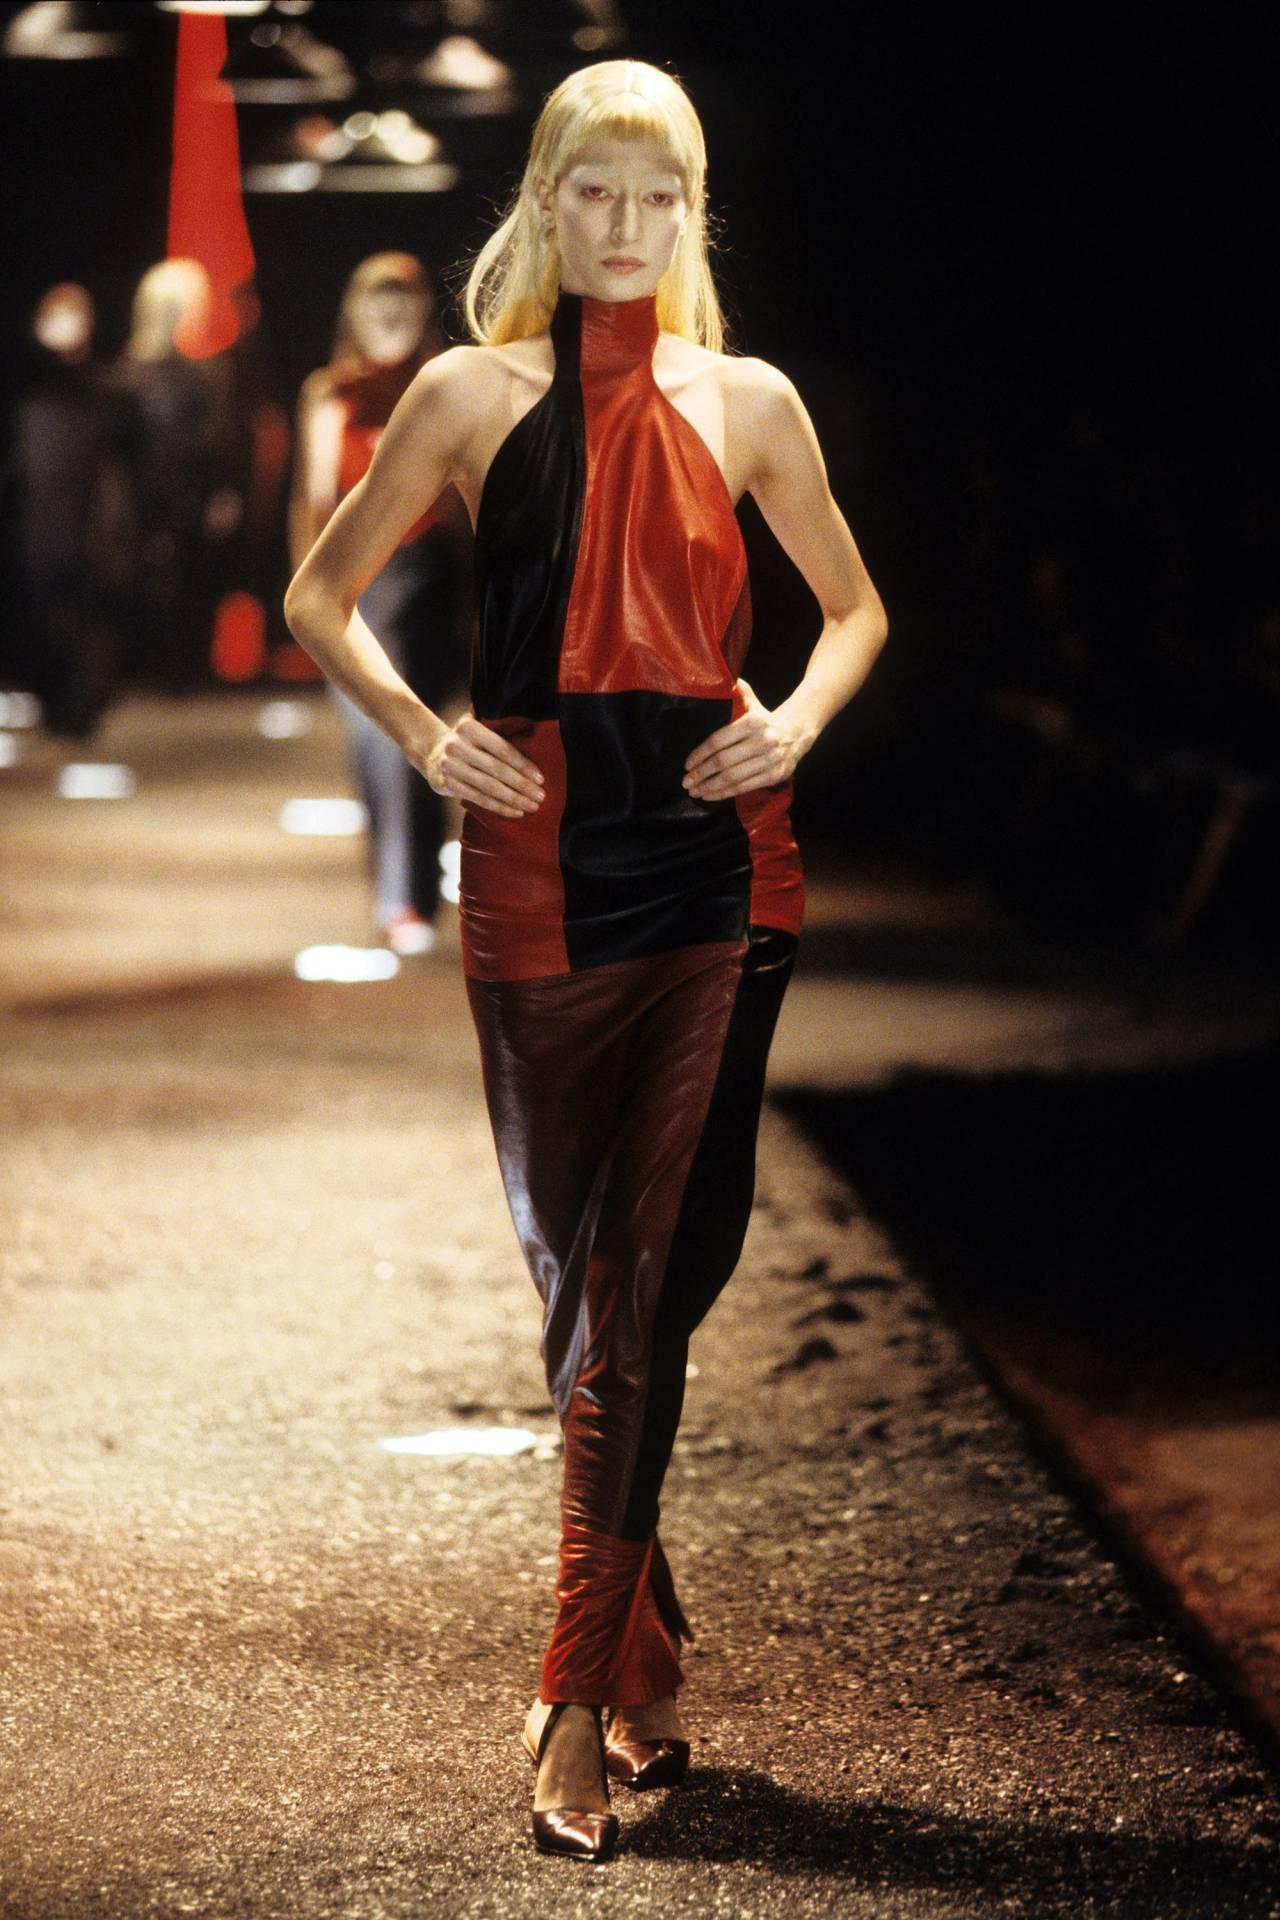 Alexander McQueen - Fall 1998 RTW #fashion#fashion show#alexander mcqueen #fall 1998 rtw #1998#supermodel#original supermodels#supermodels#90s#90s aesthetic#90s fashion#runway#model#models#beautiful#haute couture#couture#glamour#paris#milan#london #new york city